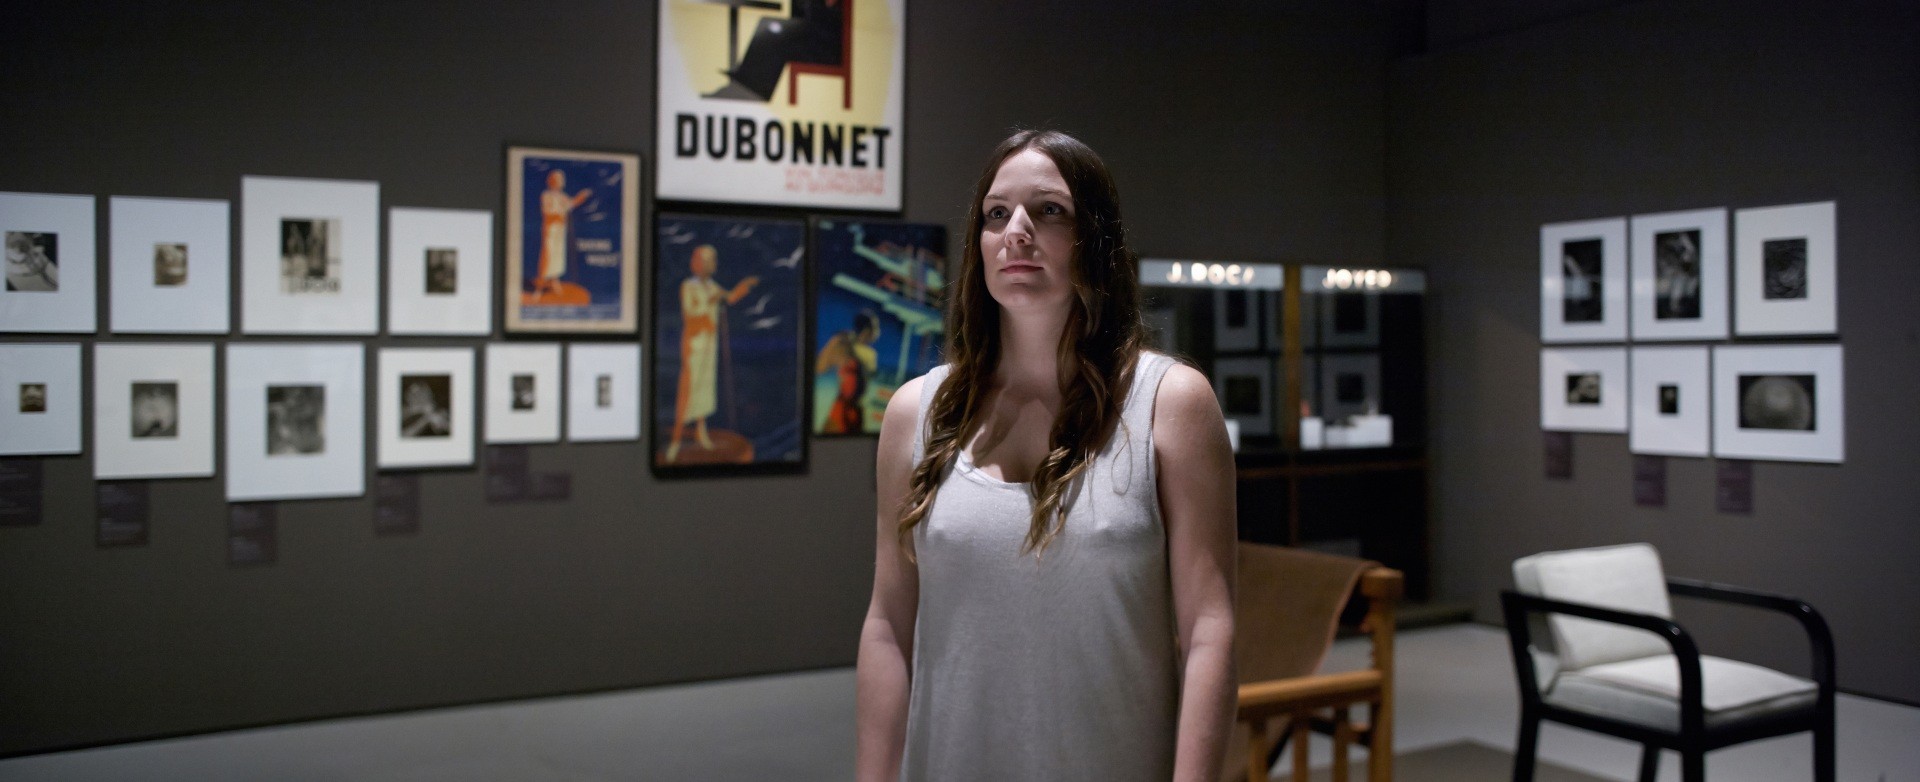 Making of de documental. La noia, una modelo que deambula por el Museu Nacional d\'Art de Catalunya. De fondo carteles y pinturas.